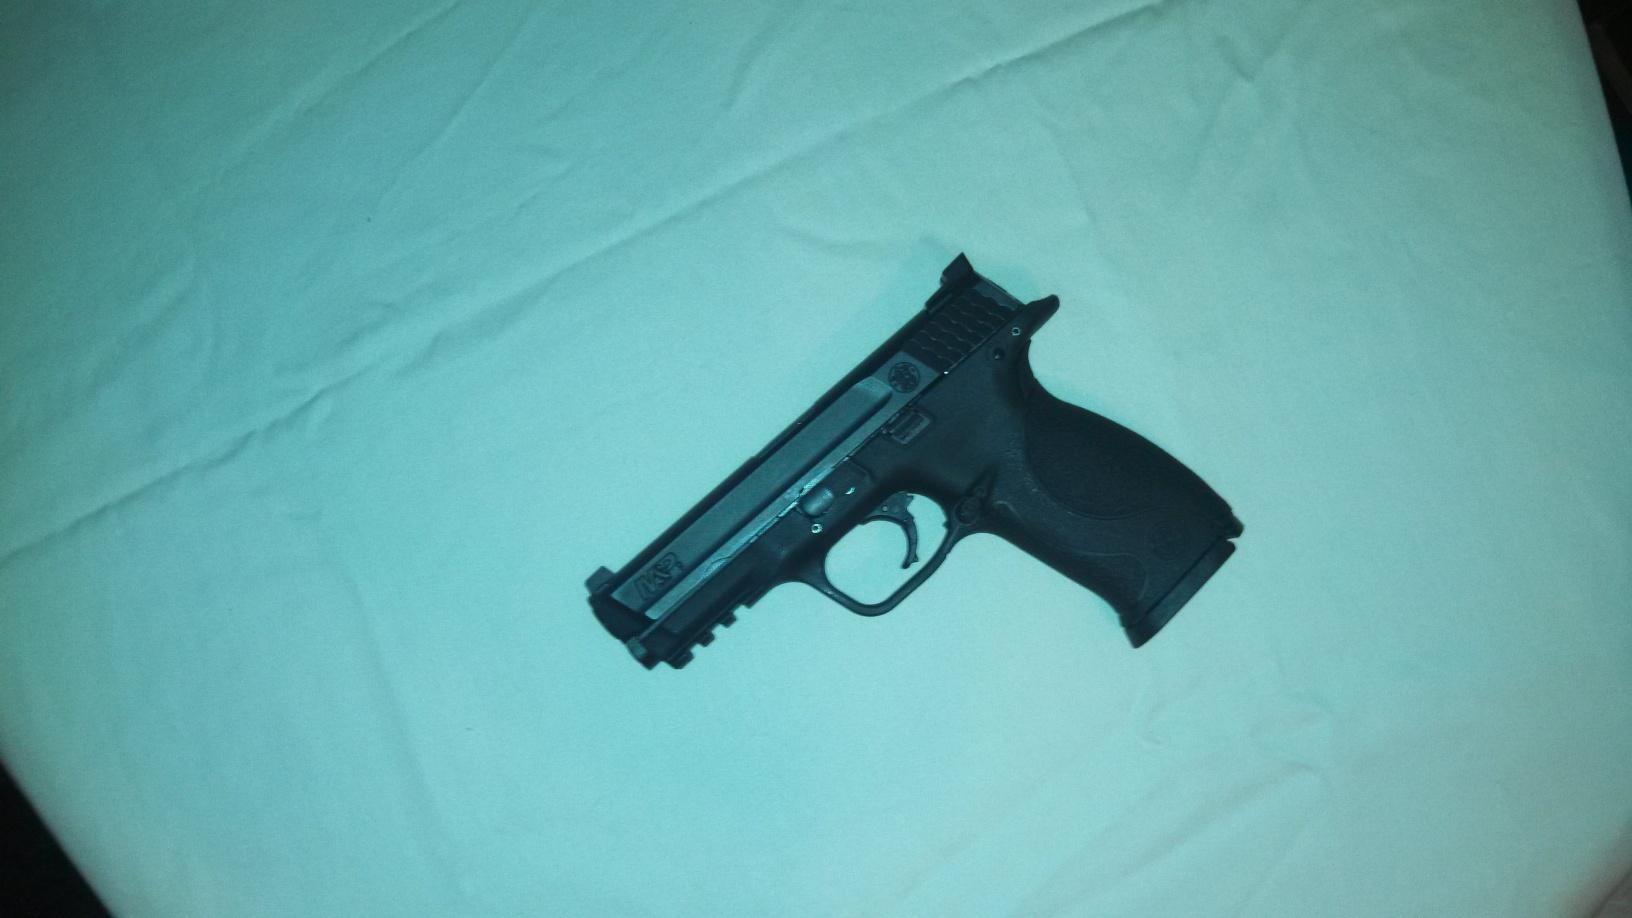 WTS:  Full size 9mm M&P-img_20140525_134954_452.jpg